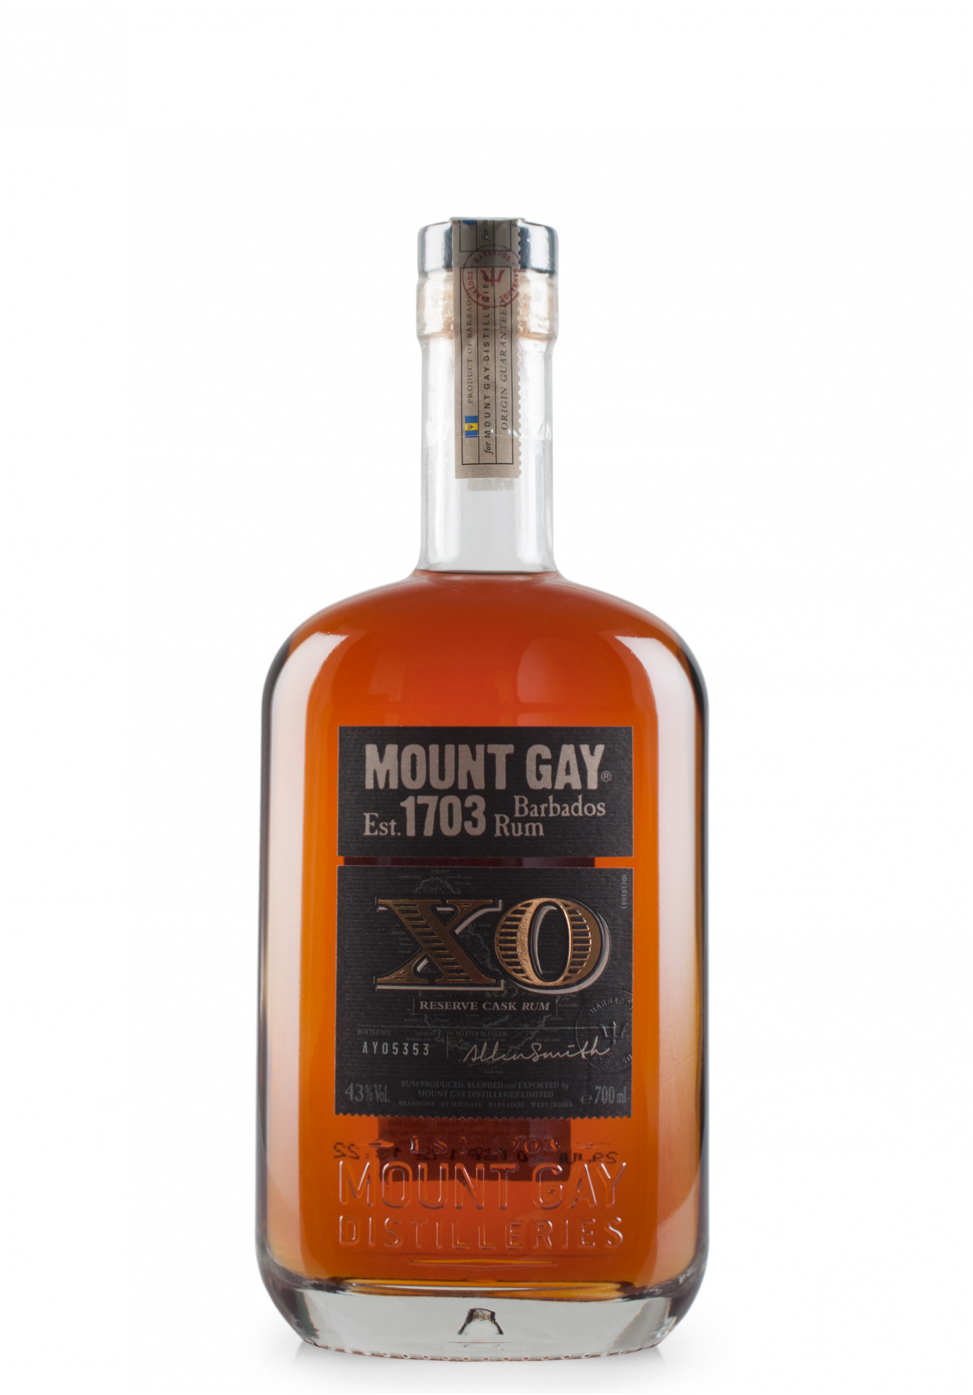 Rom Mount Gay Rum XO, Island of Barbados (0.7L)